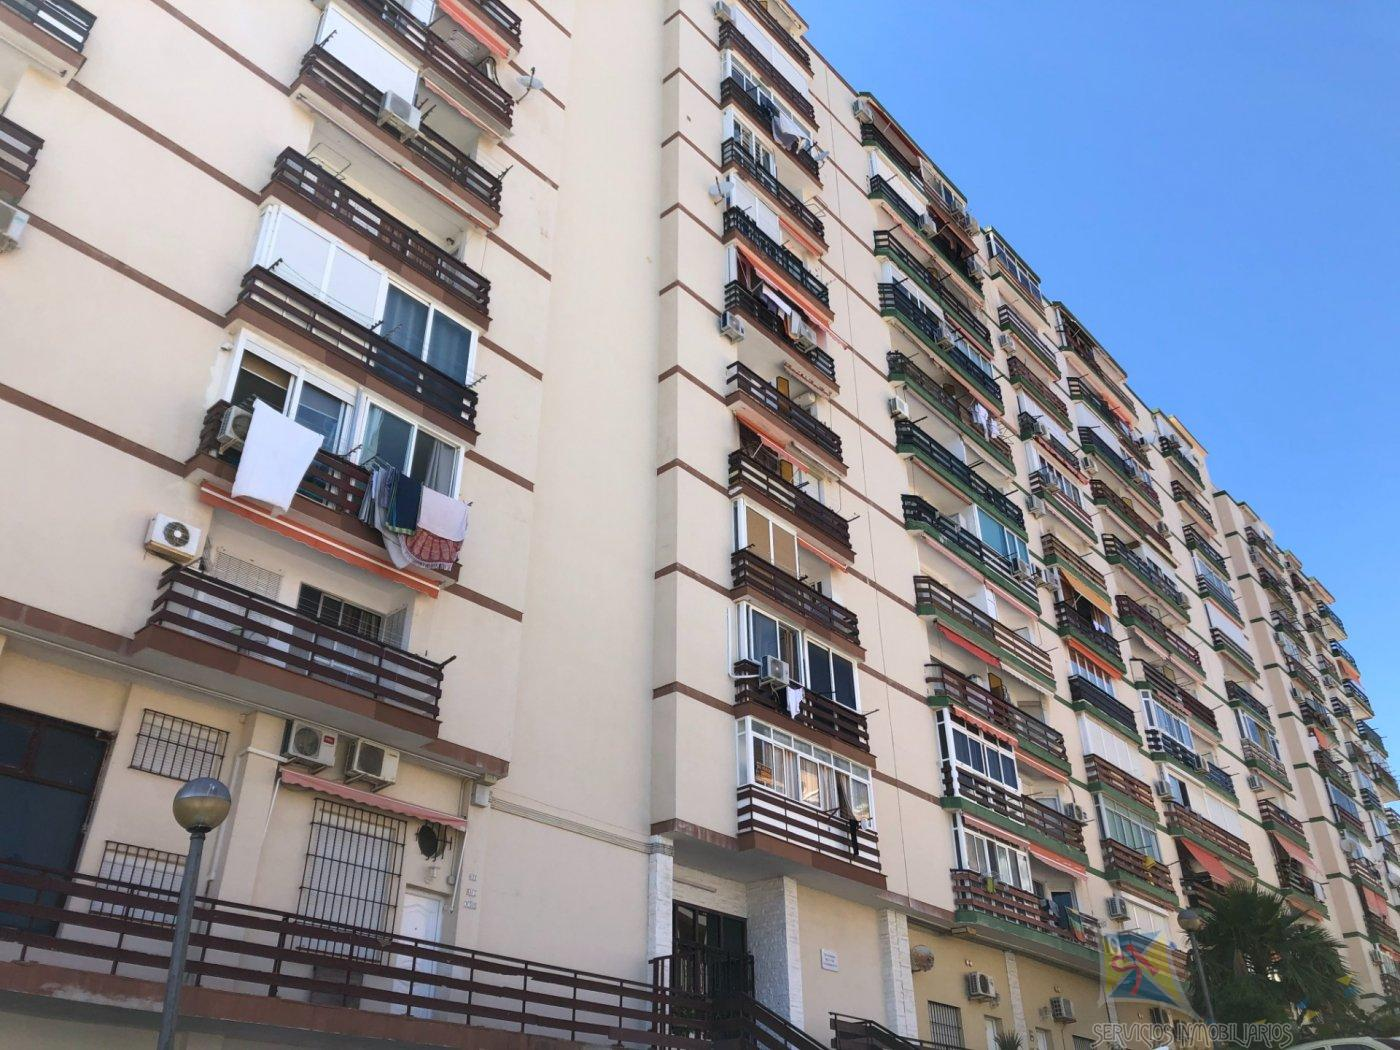 For sale of study in Benalmádena